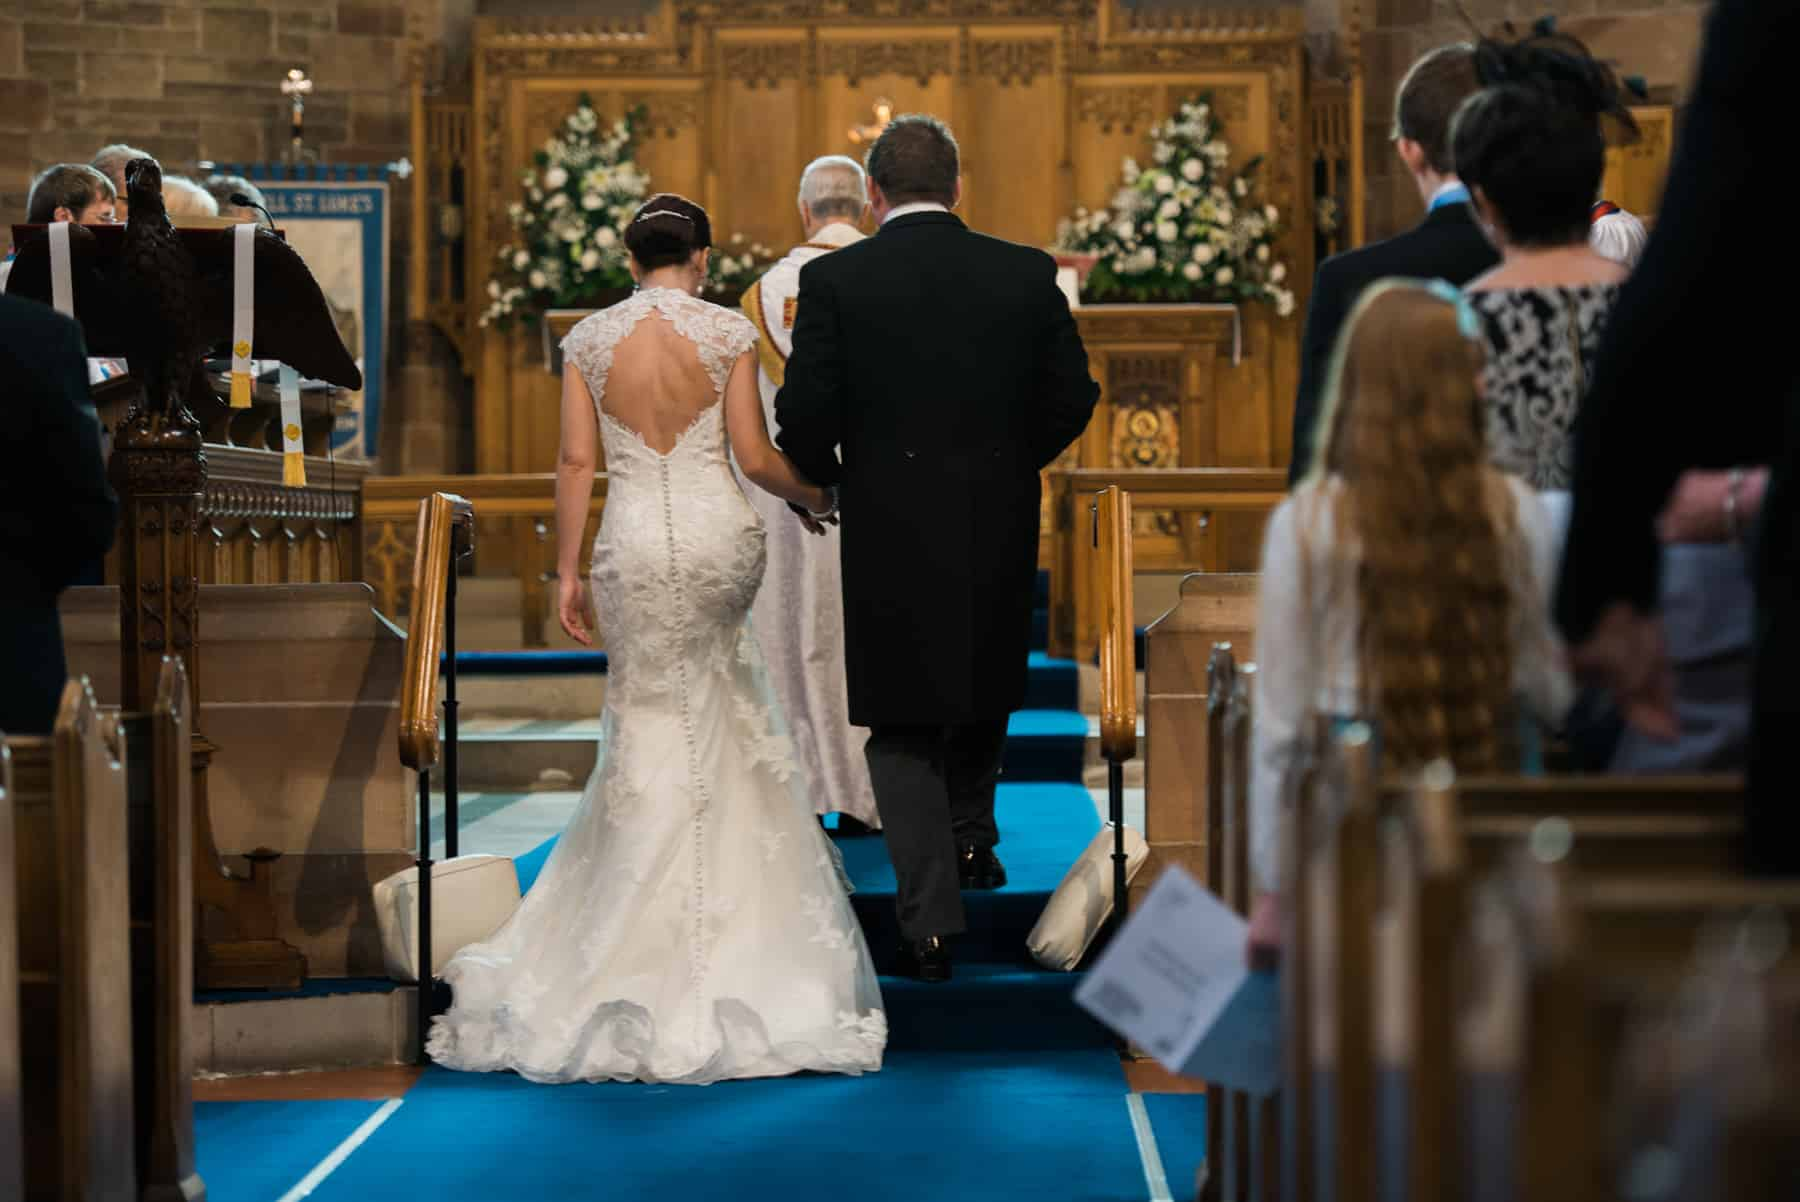 wedding photography ceremony (1 of 1)